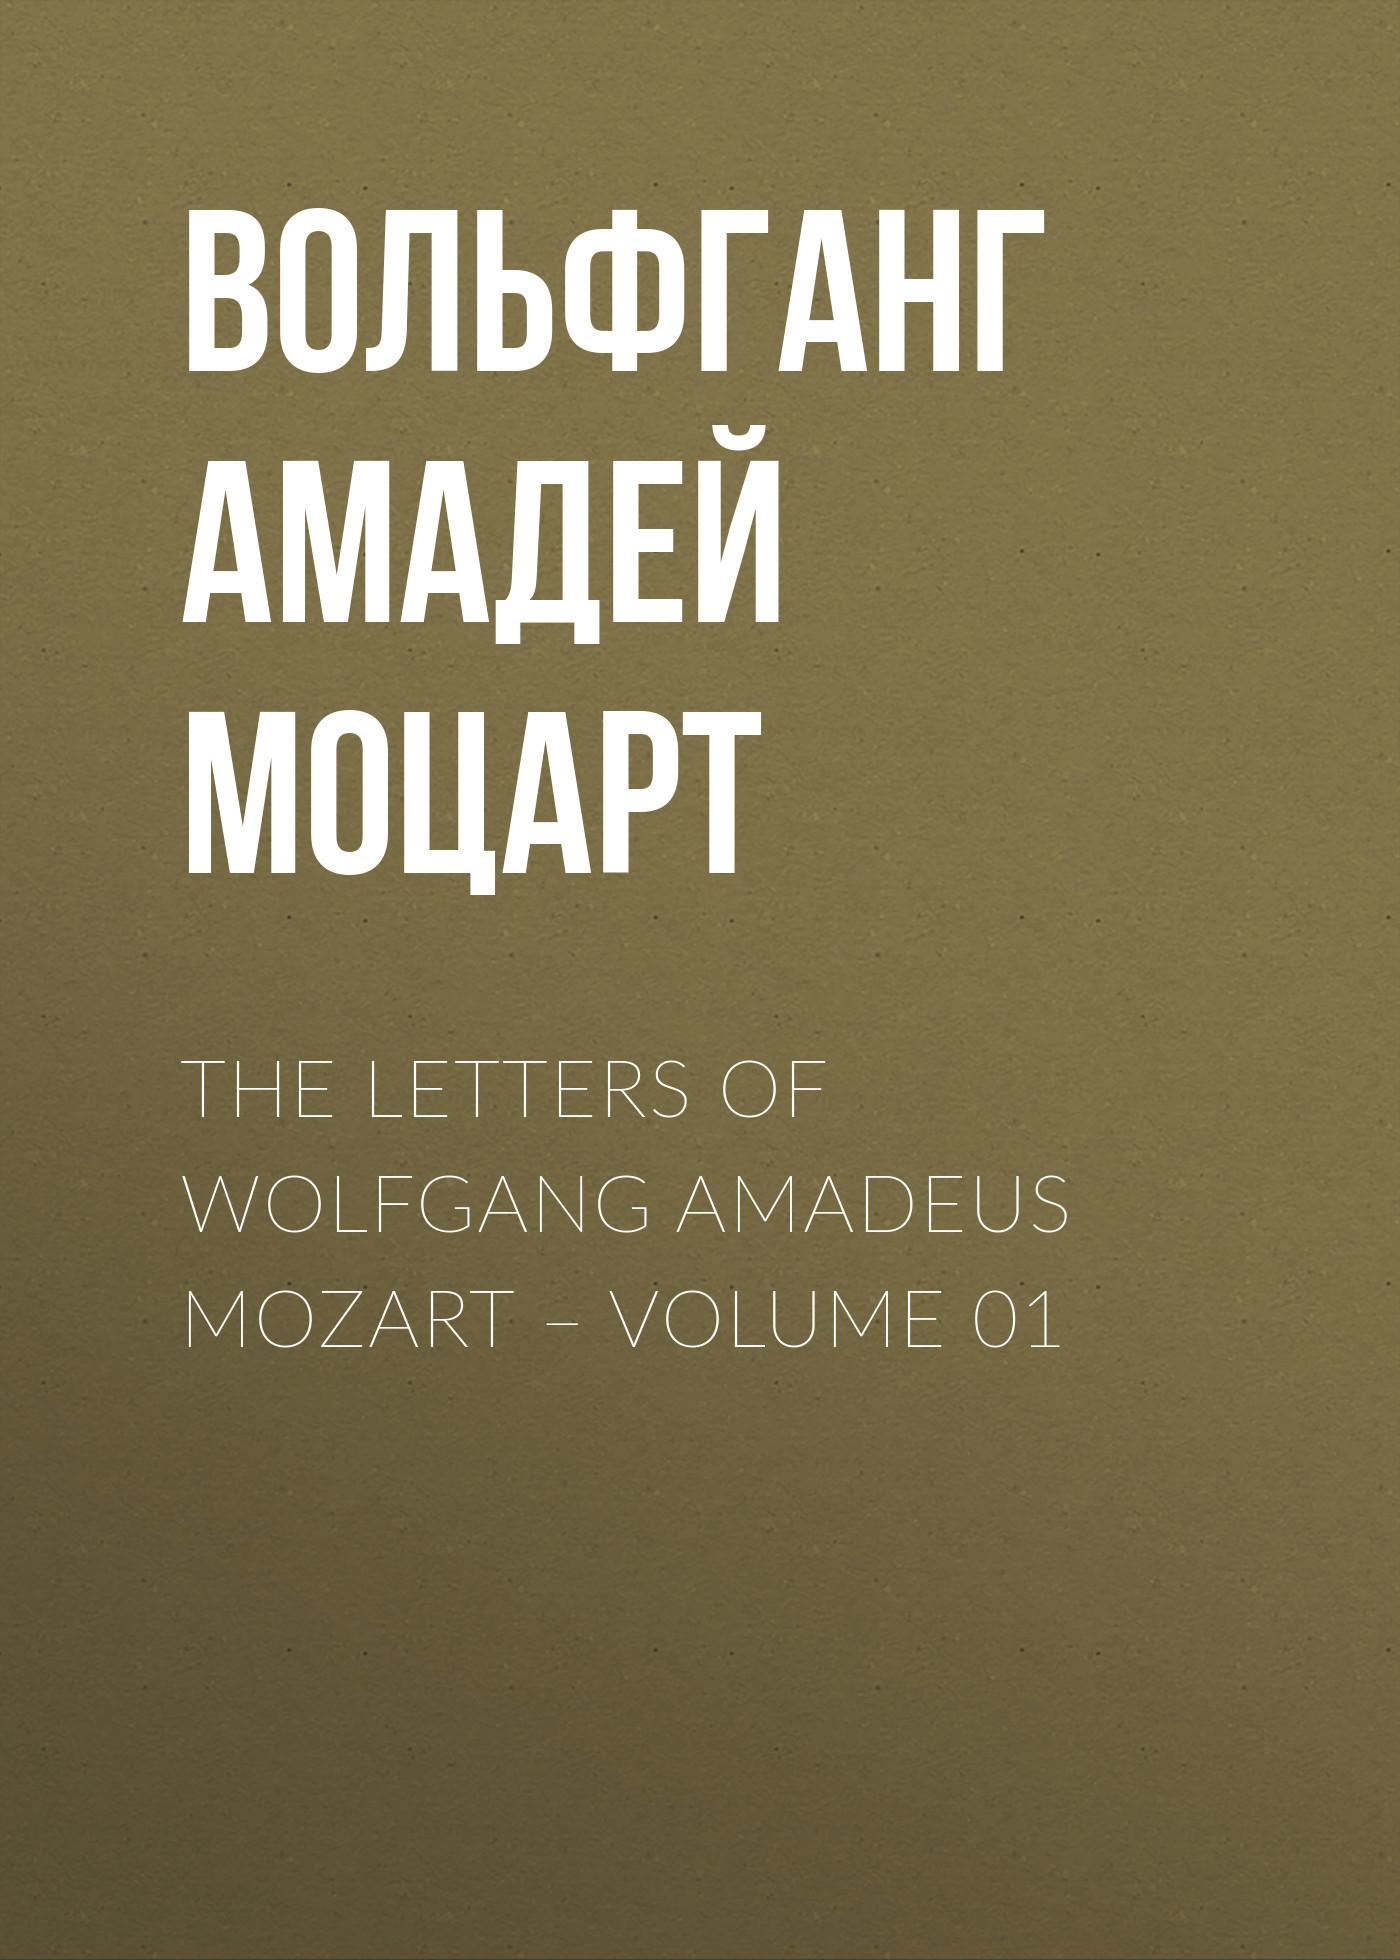 Вольфганг Амадей Моцарт The Letters of Wolfgang Amadeus Mozart – Volume 01 андреас стайер вольфганг моцарт andreas staier mozart piano sonatas 2 cd